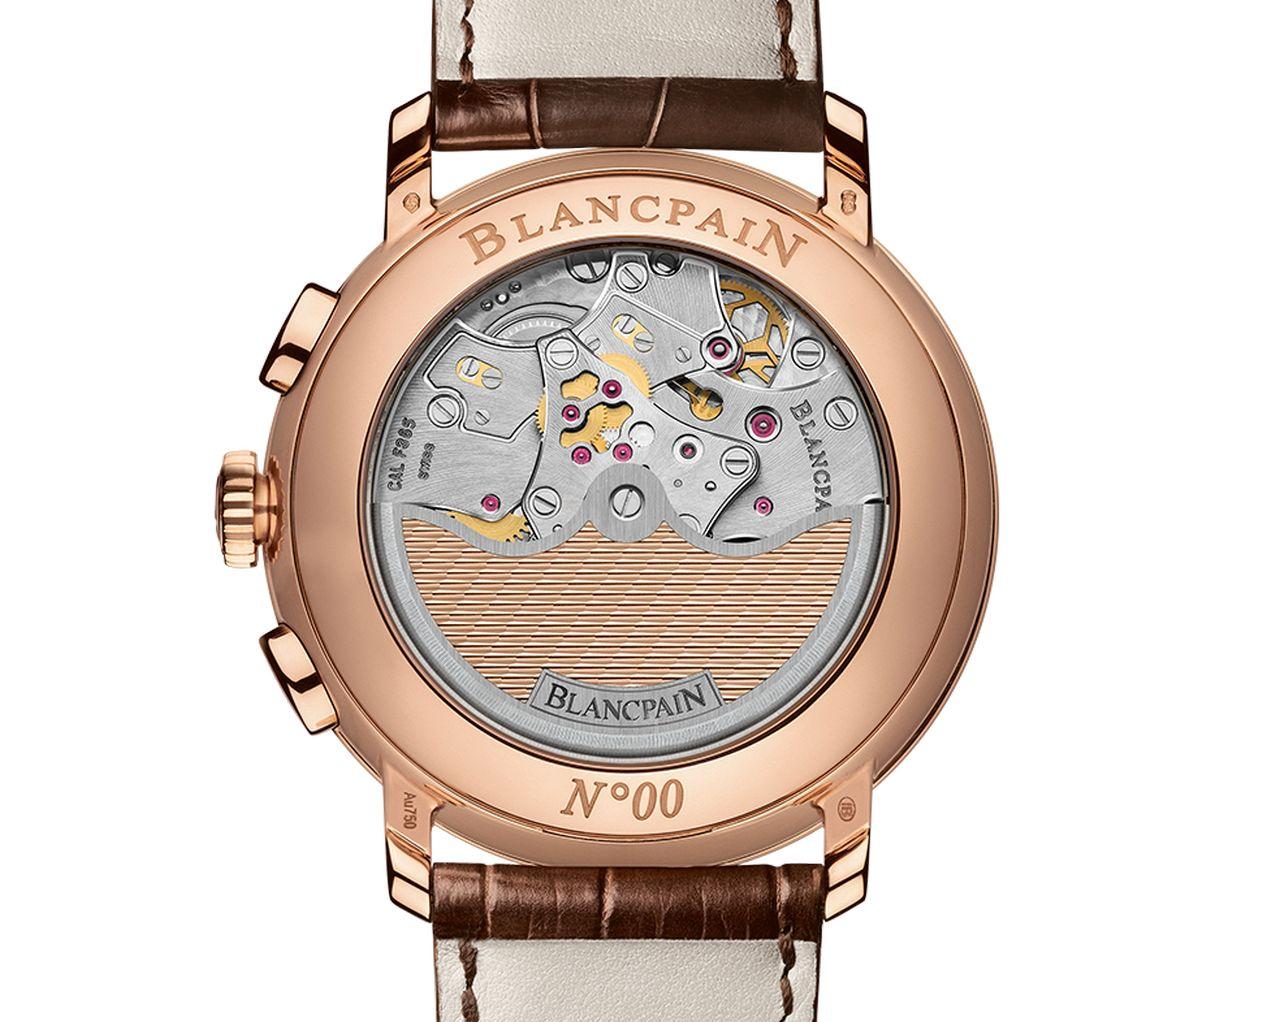 blancpain-villeret-pulsometer-flyback-chronograph-ref-6680f-3631-55b-prezzo-price-0-100_4